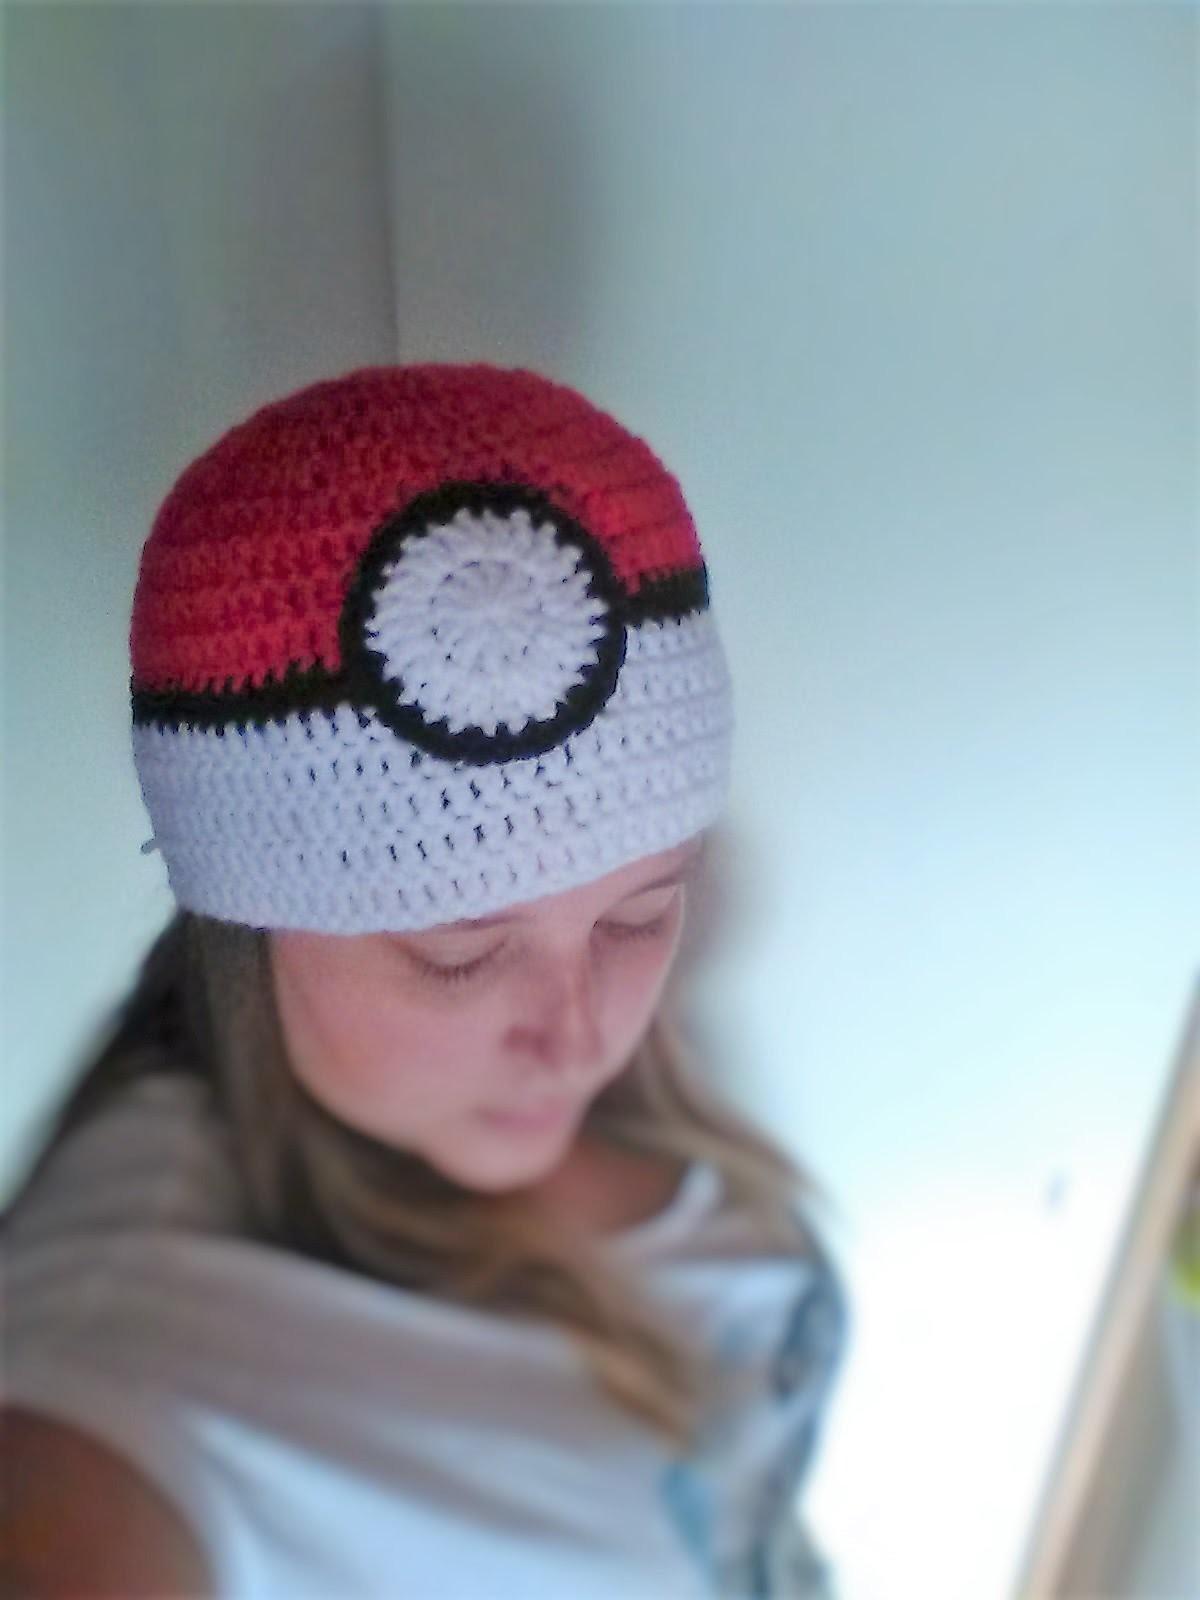 Gotta wear 'em all - How to crochet a pokéball beanie